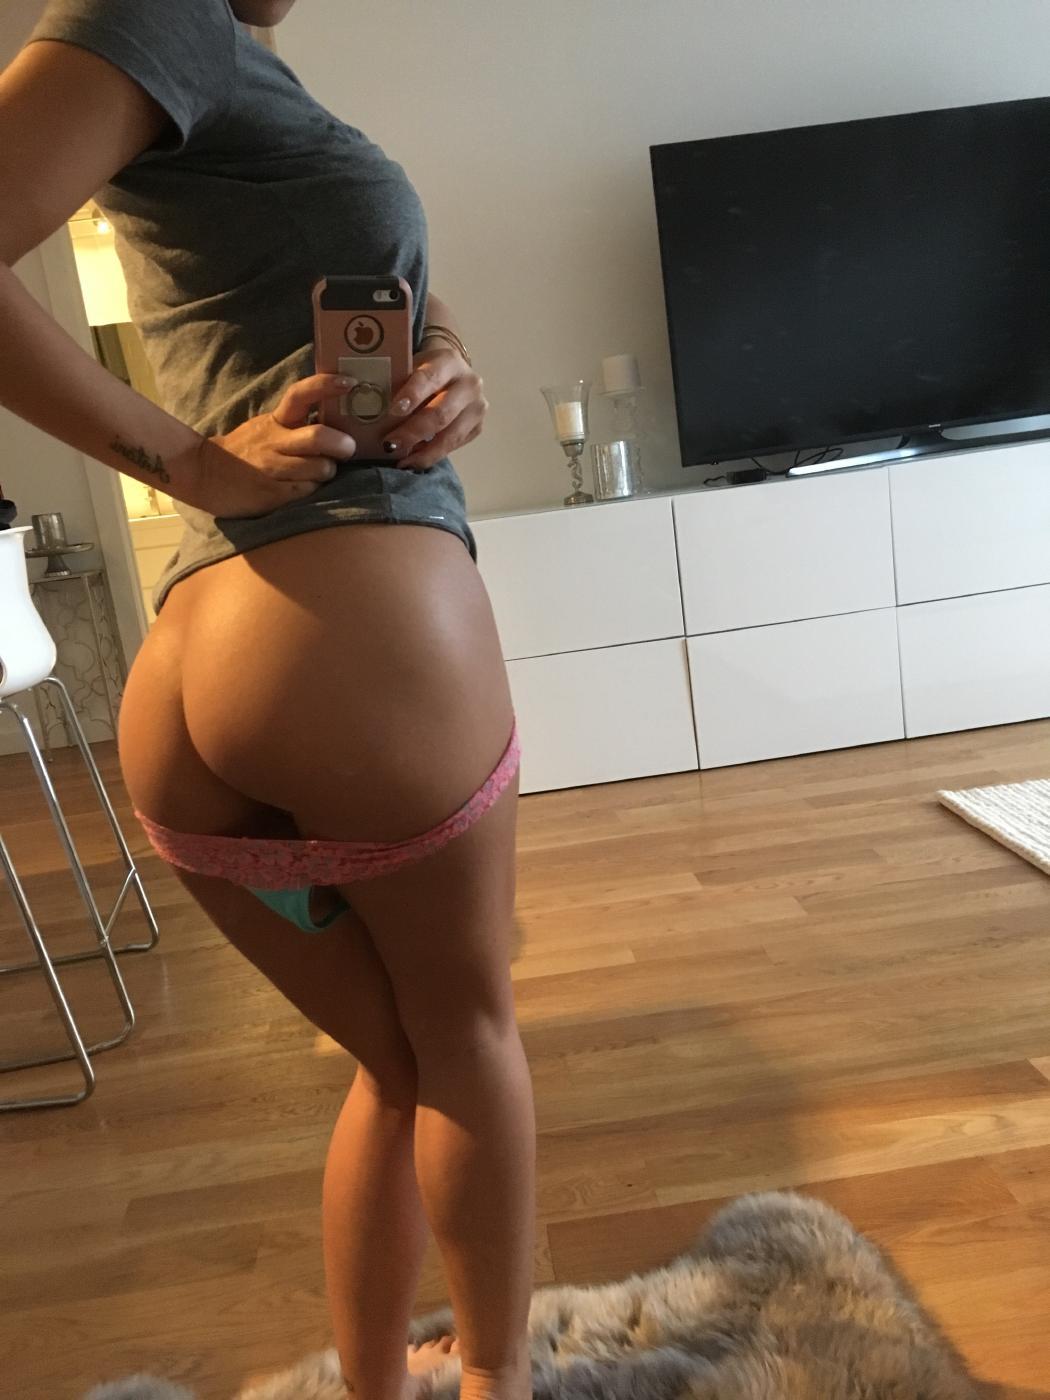 Asa Akira Nude Strip Selfies Onlyfans Set Leaked Ycceef